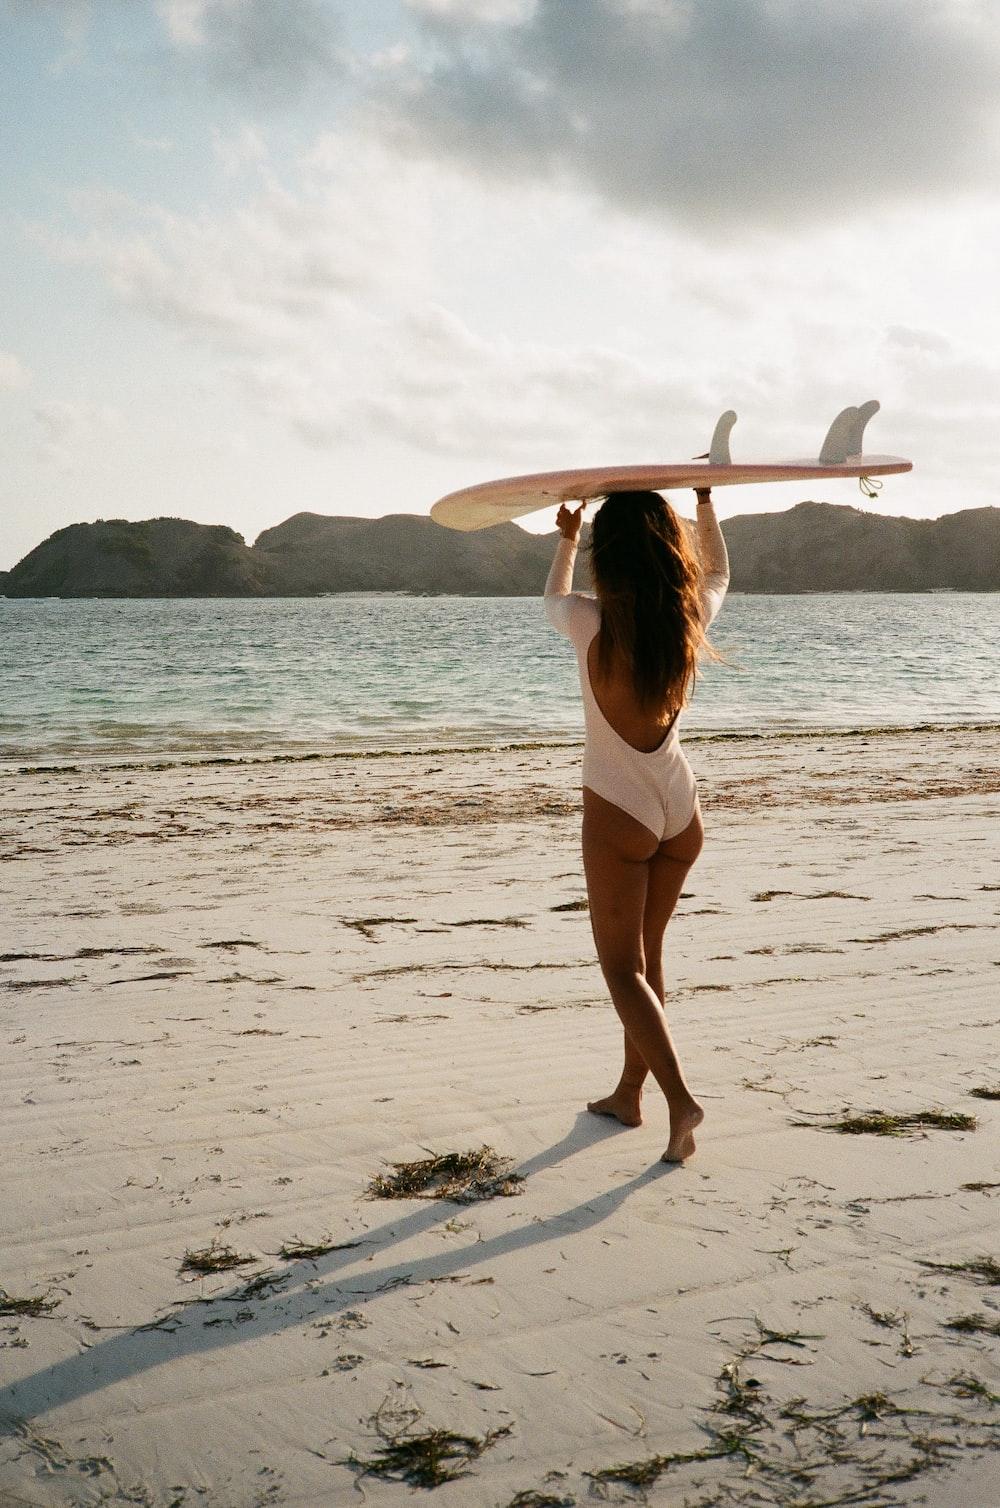 woman in white bikini holding white surfboard standing on beach during daytime